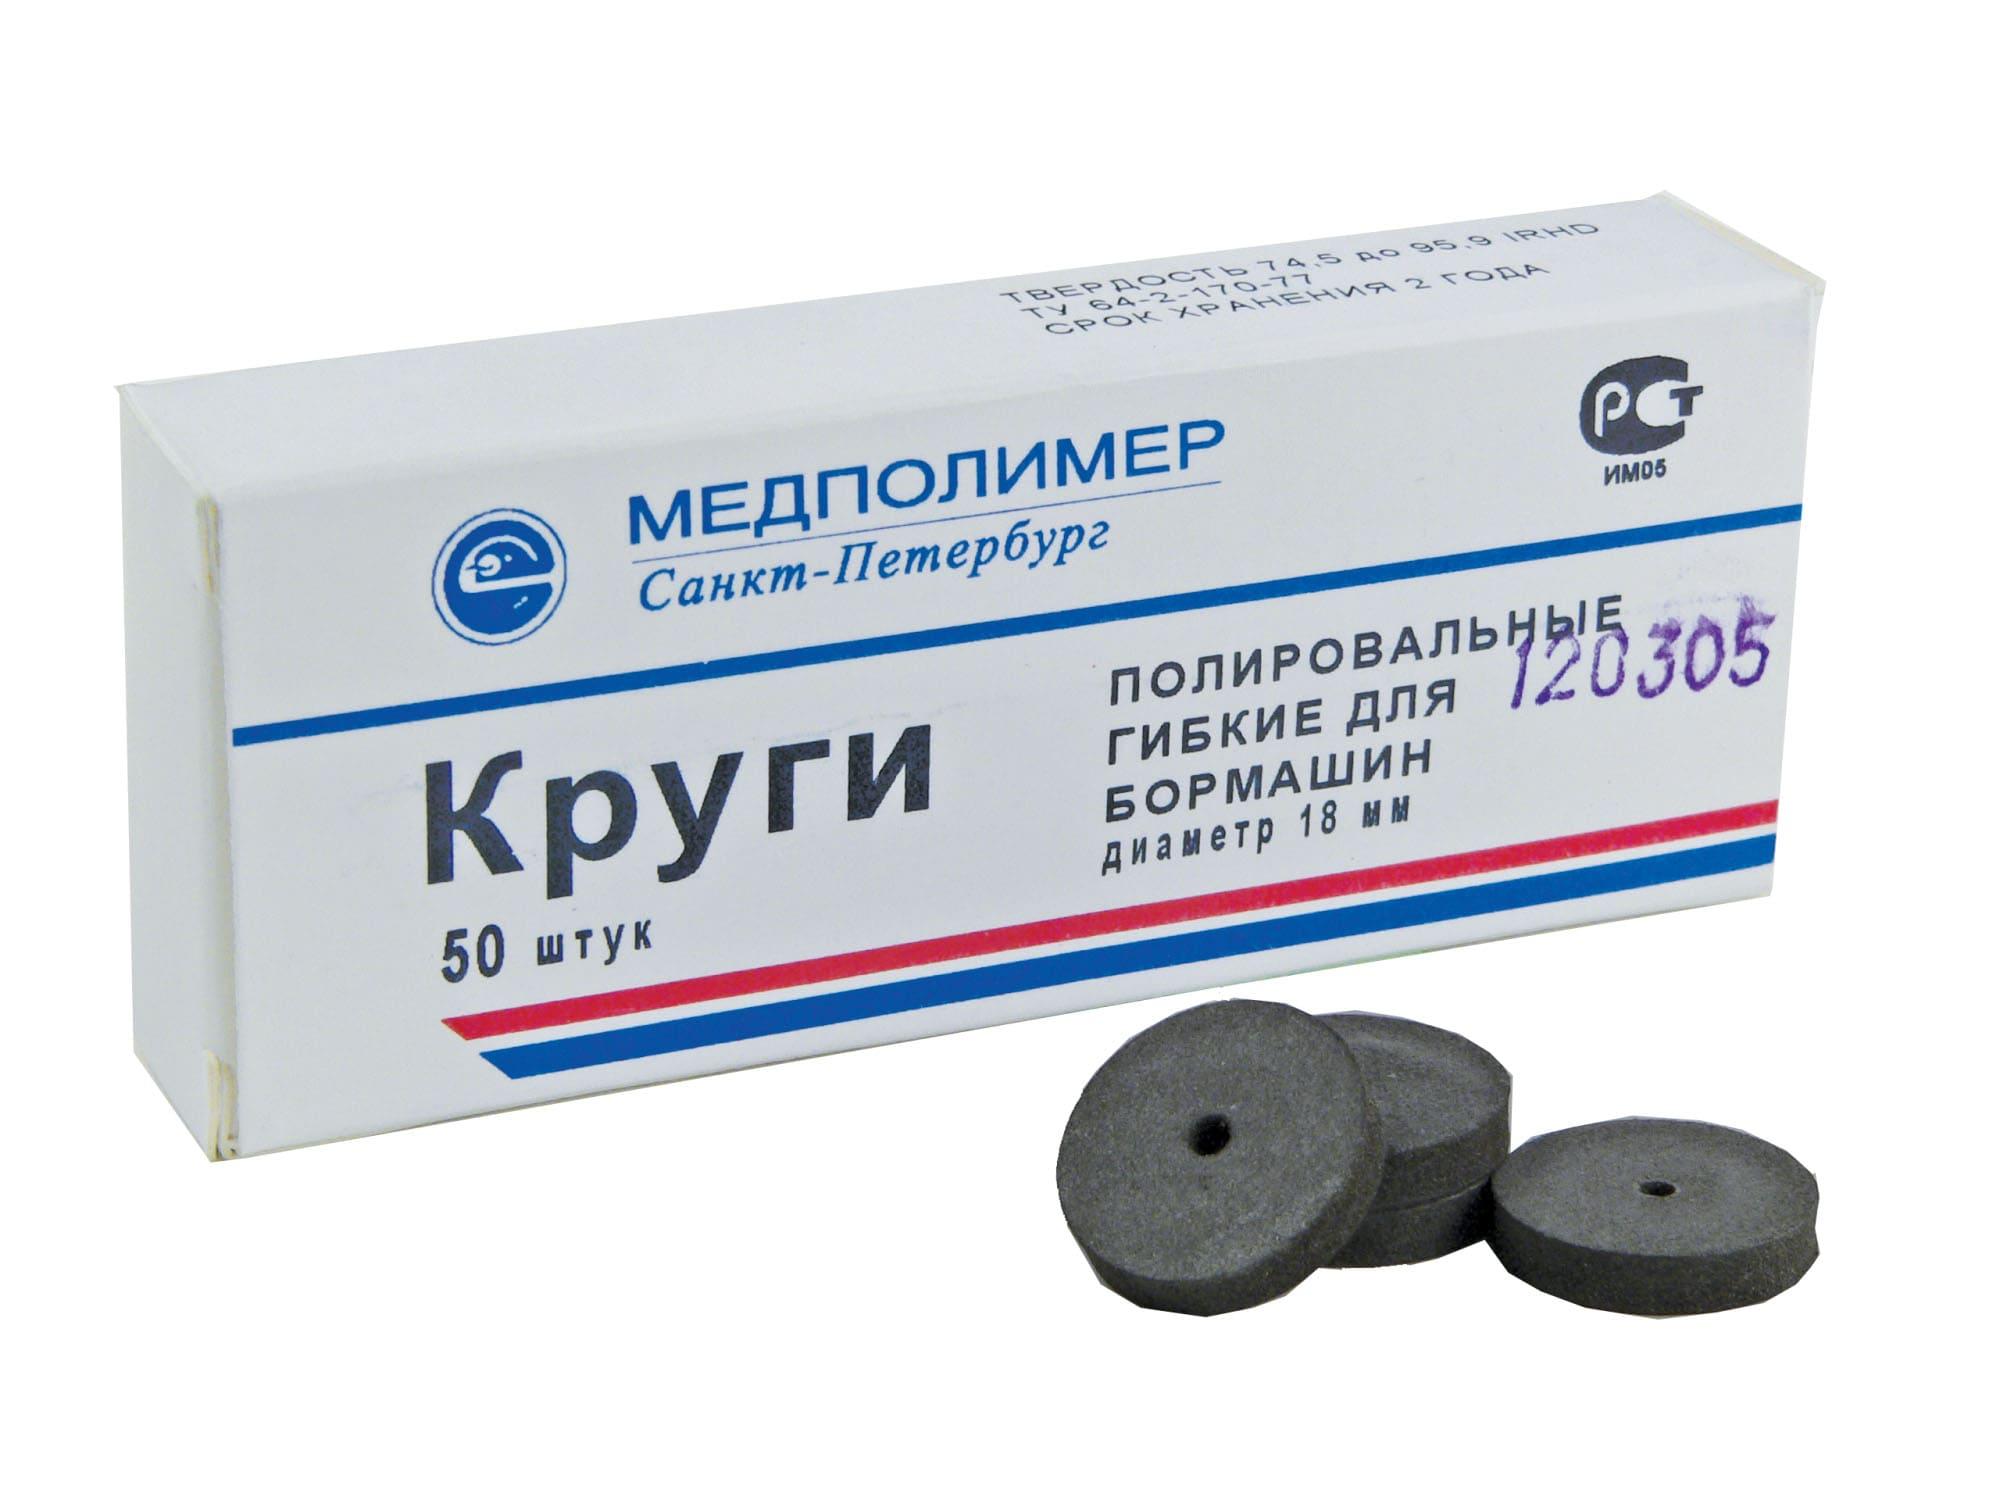 Круг КПГ-18 полир.гибкий (50 шт) Медполимер